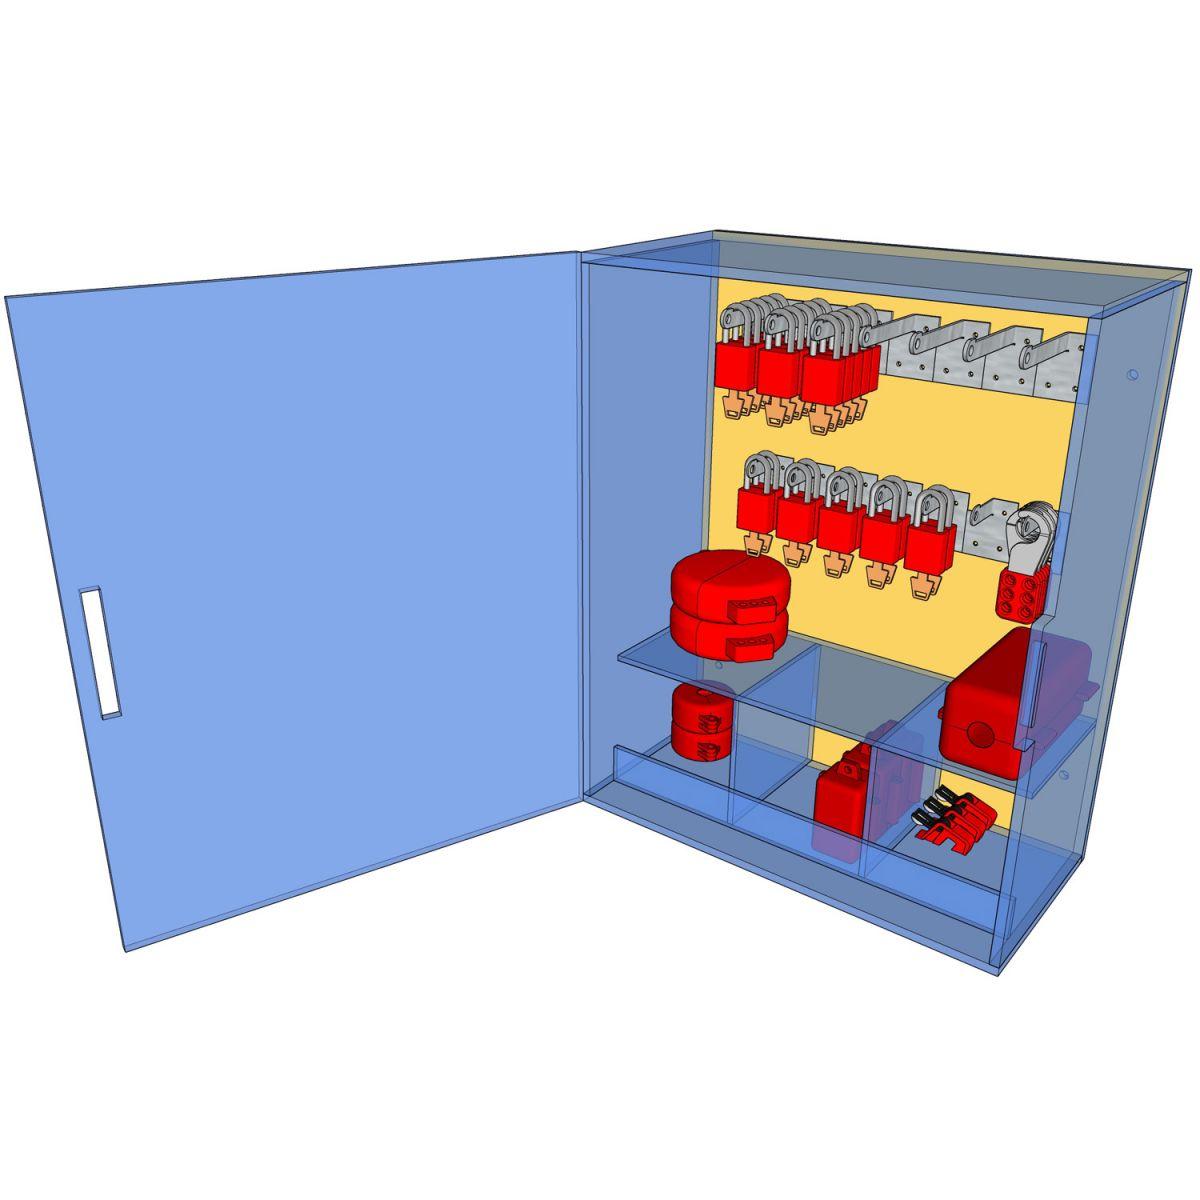 Postes de cadenassage en polycarbonate   PLC-1824